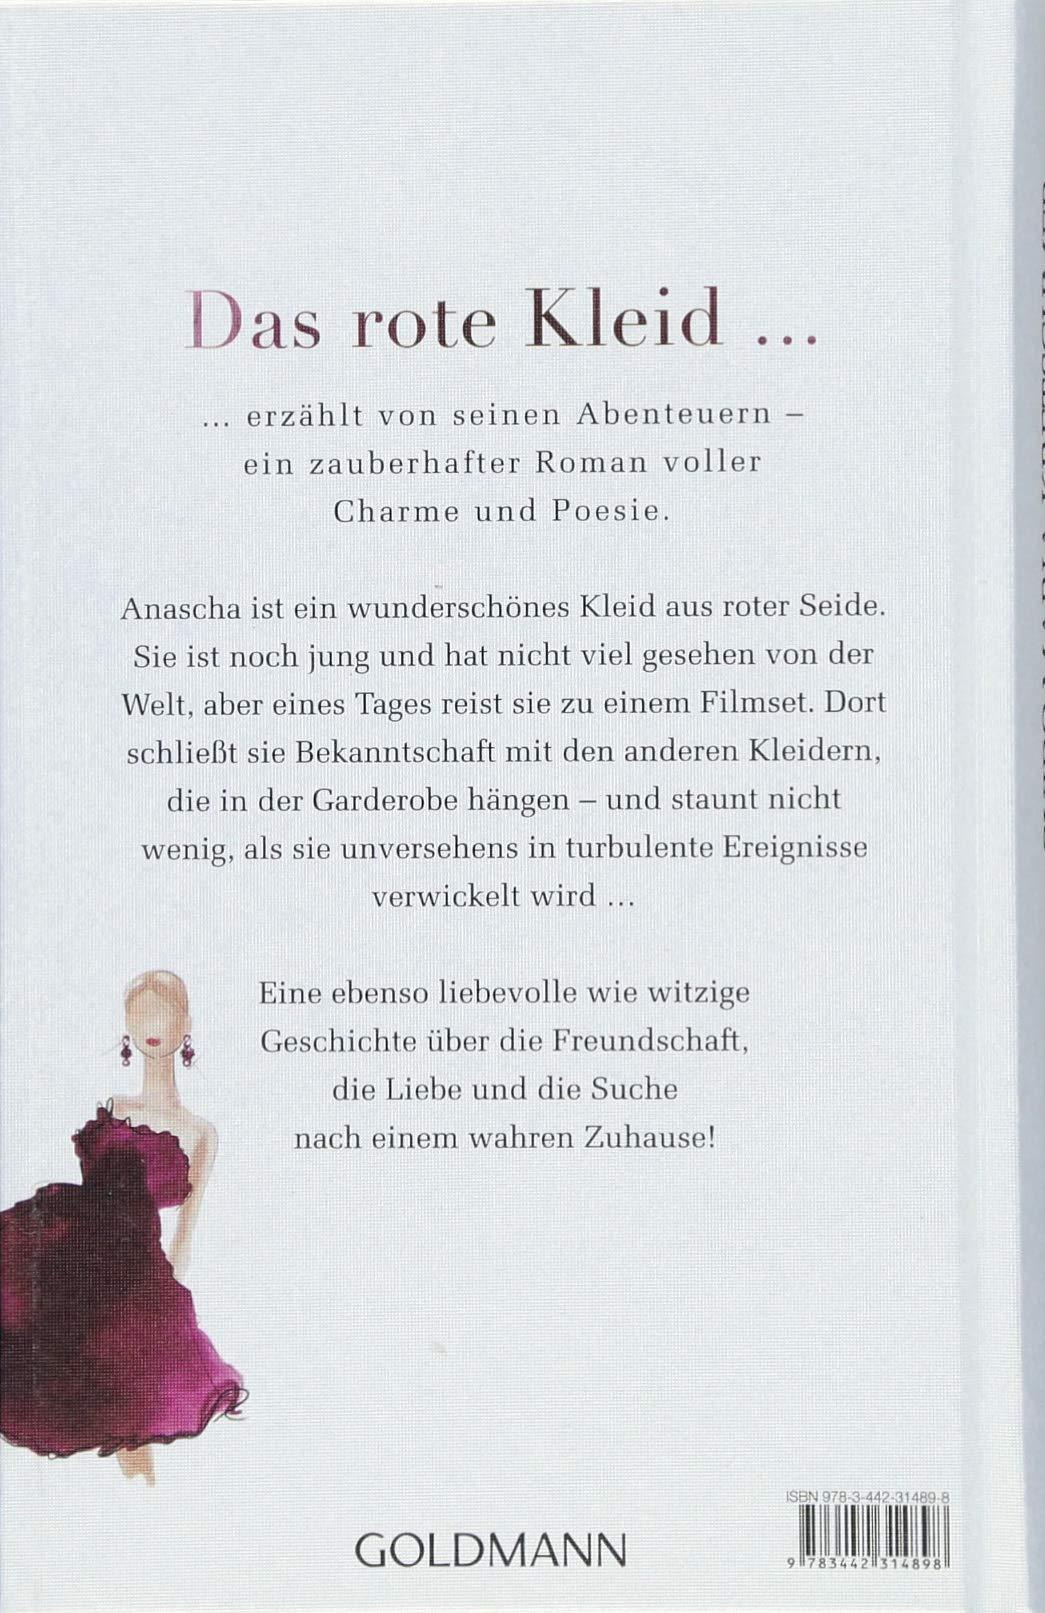 f88c4e48f38d Das rote Kleid  Roman  Amazon.de  Guido Maria Kretschmer  Bücher